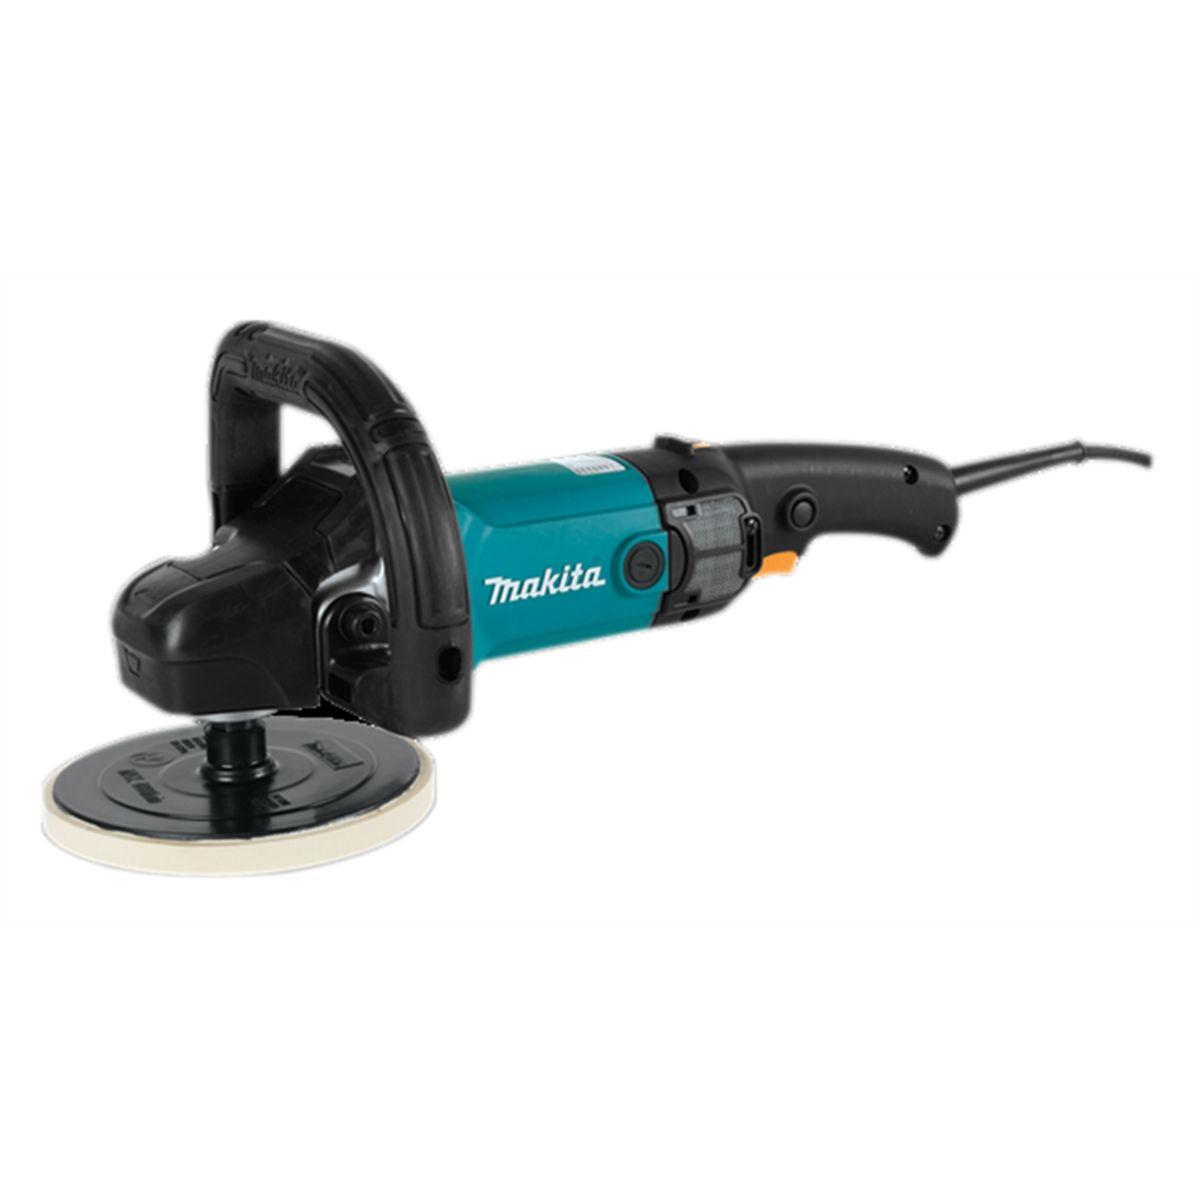 7 Inch Electric Polisher Makita 9237c